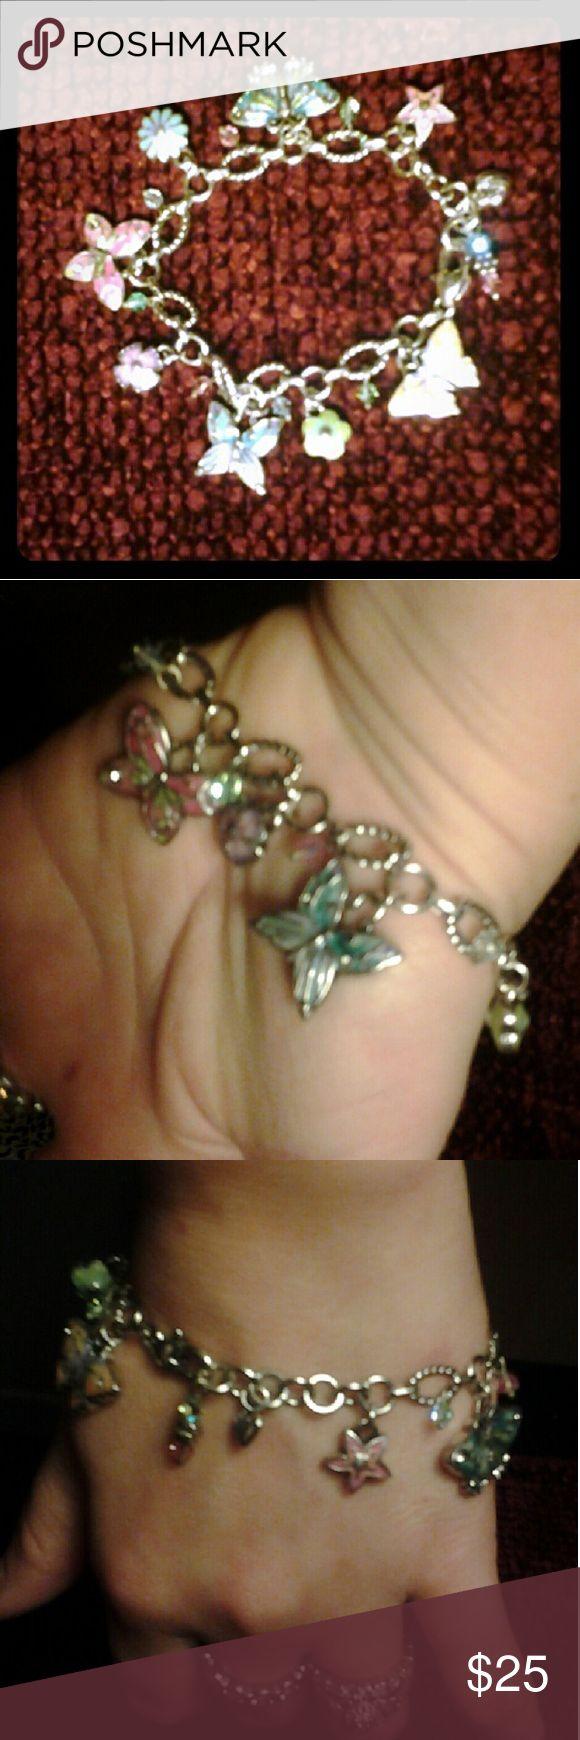 Selling this Brighton Butterfly Charm Bracelet on Poshmark! My username is: shoptiludrop5. #shopmycloset #poshmark #fashion #shopping #style #forsale #Brighton  #Jewelry